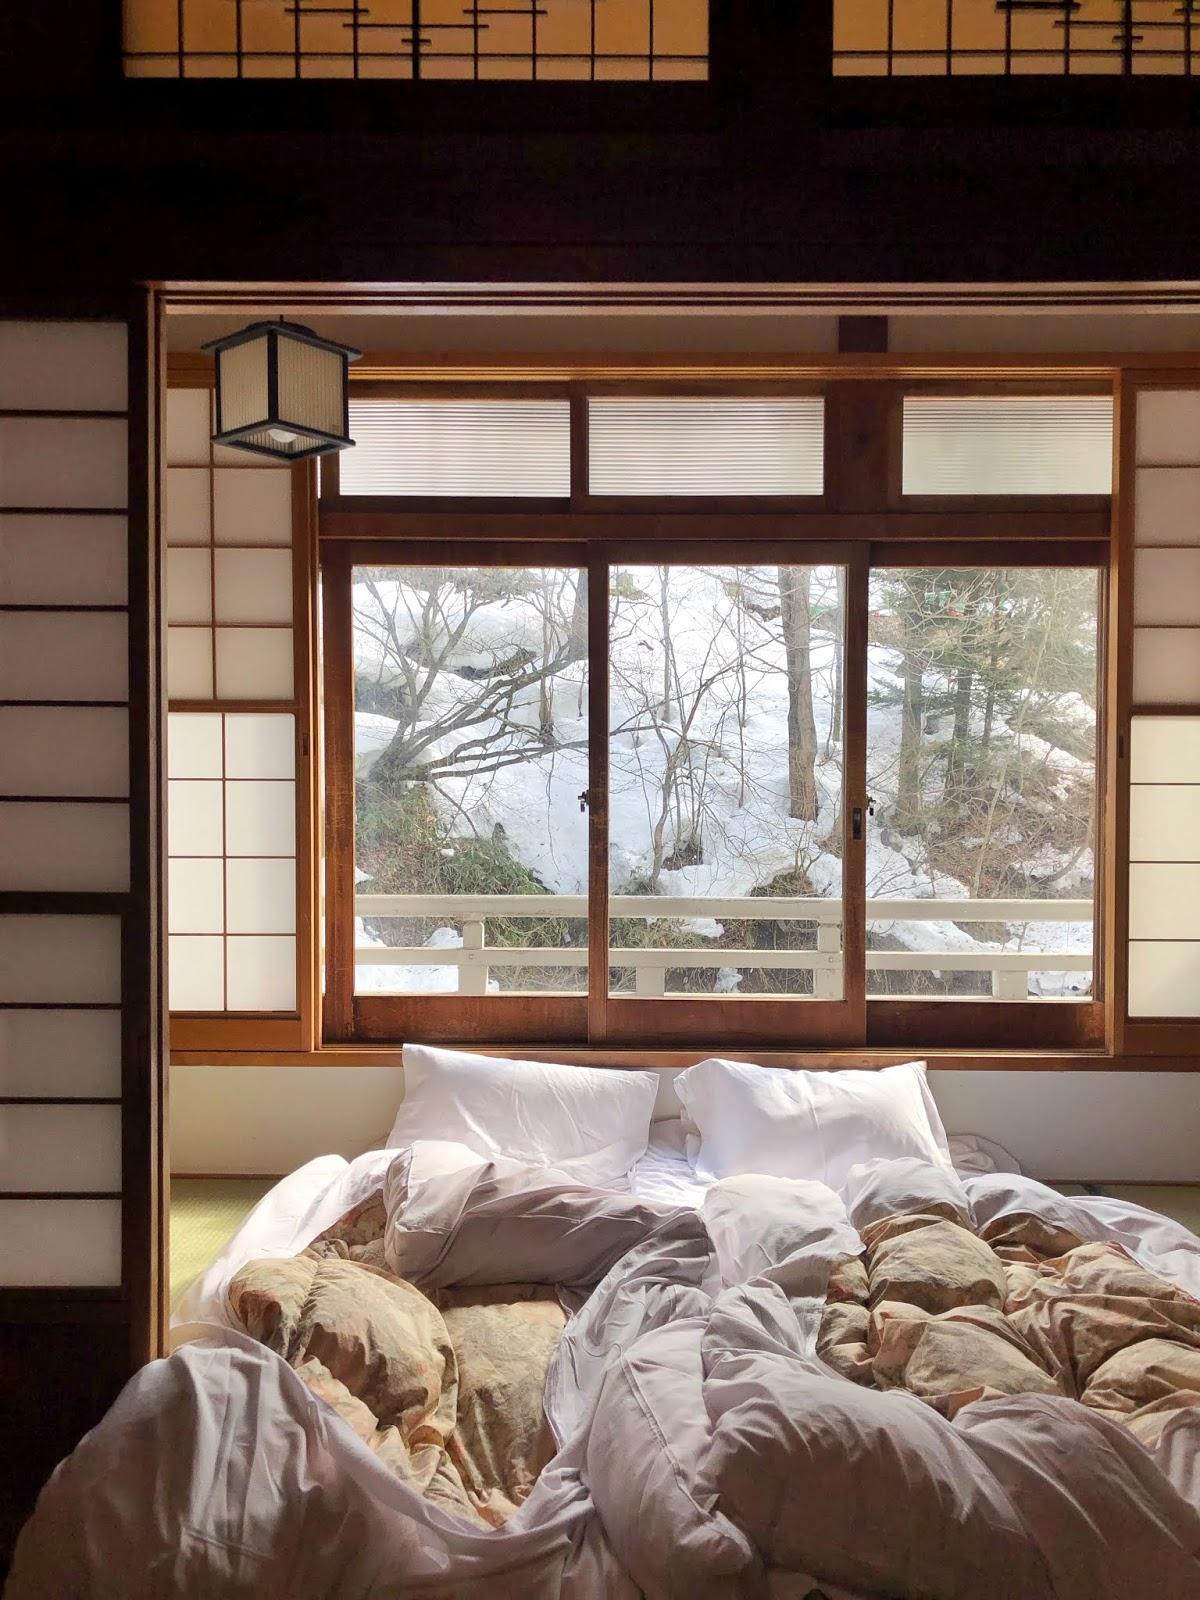 Ryokan stay, wooden japanese room, Biggest open-air bath onsen in Japan. Takaragawa Onsen, Minakami Gunma, Japan / FOREVERVANNY.com